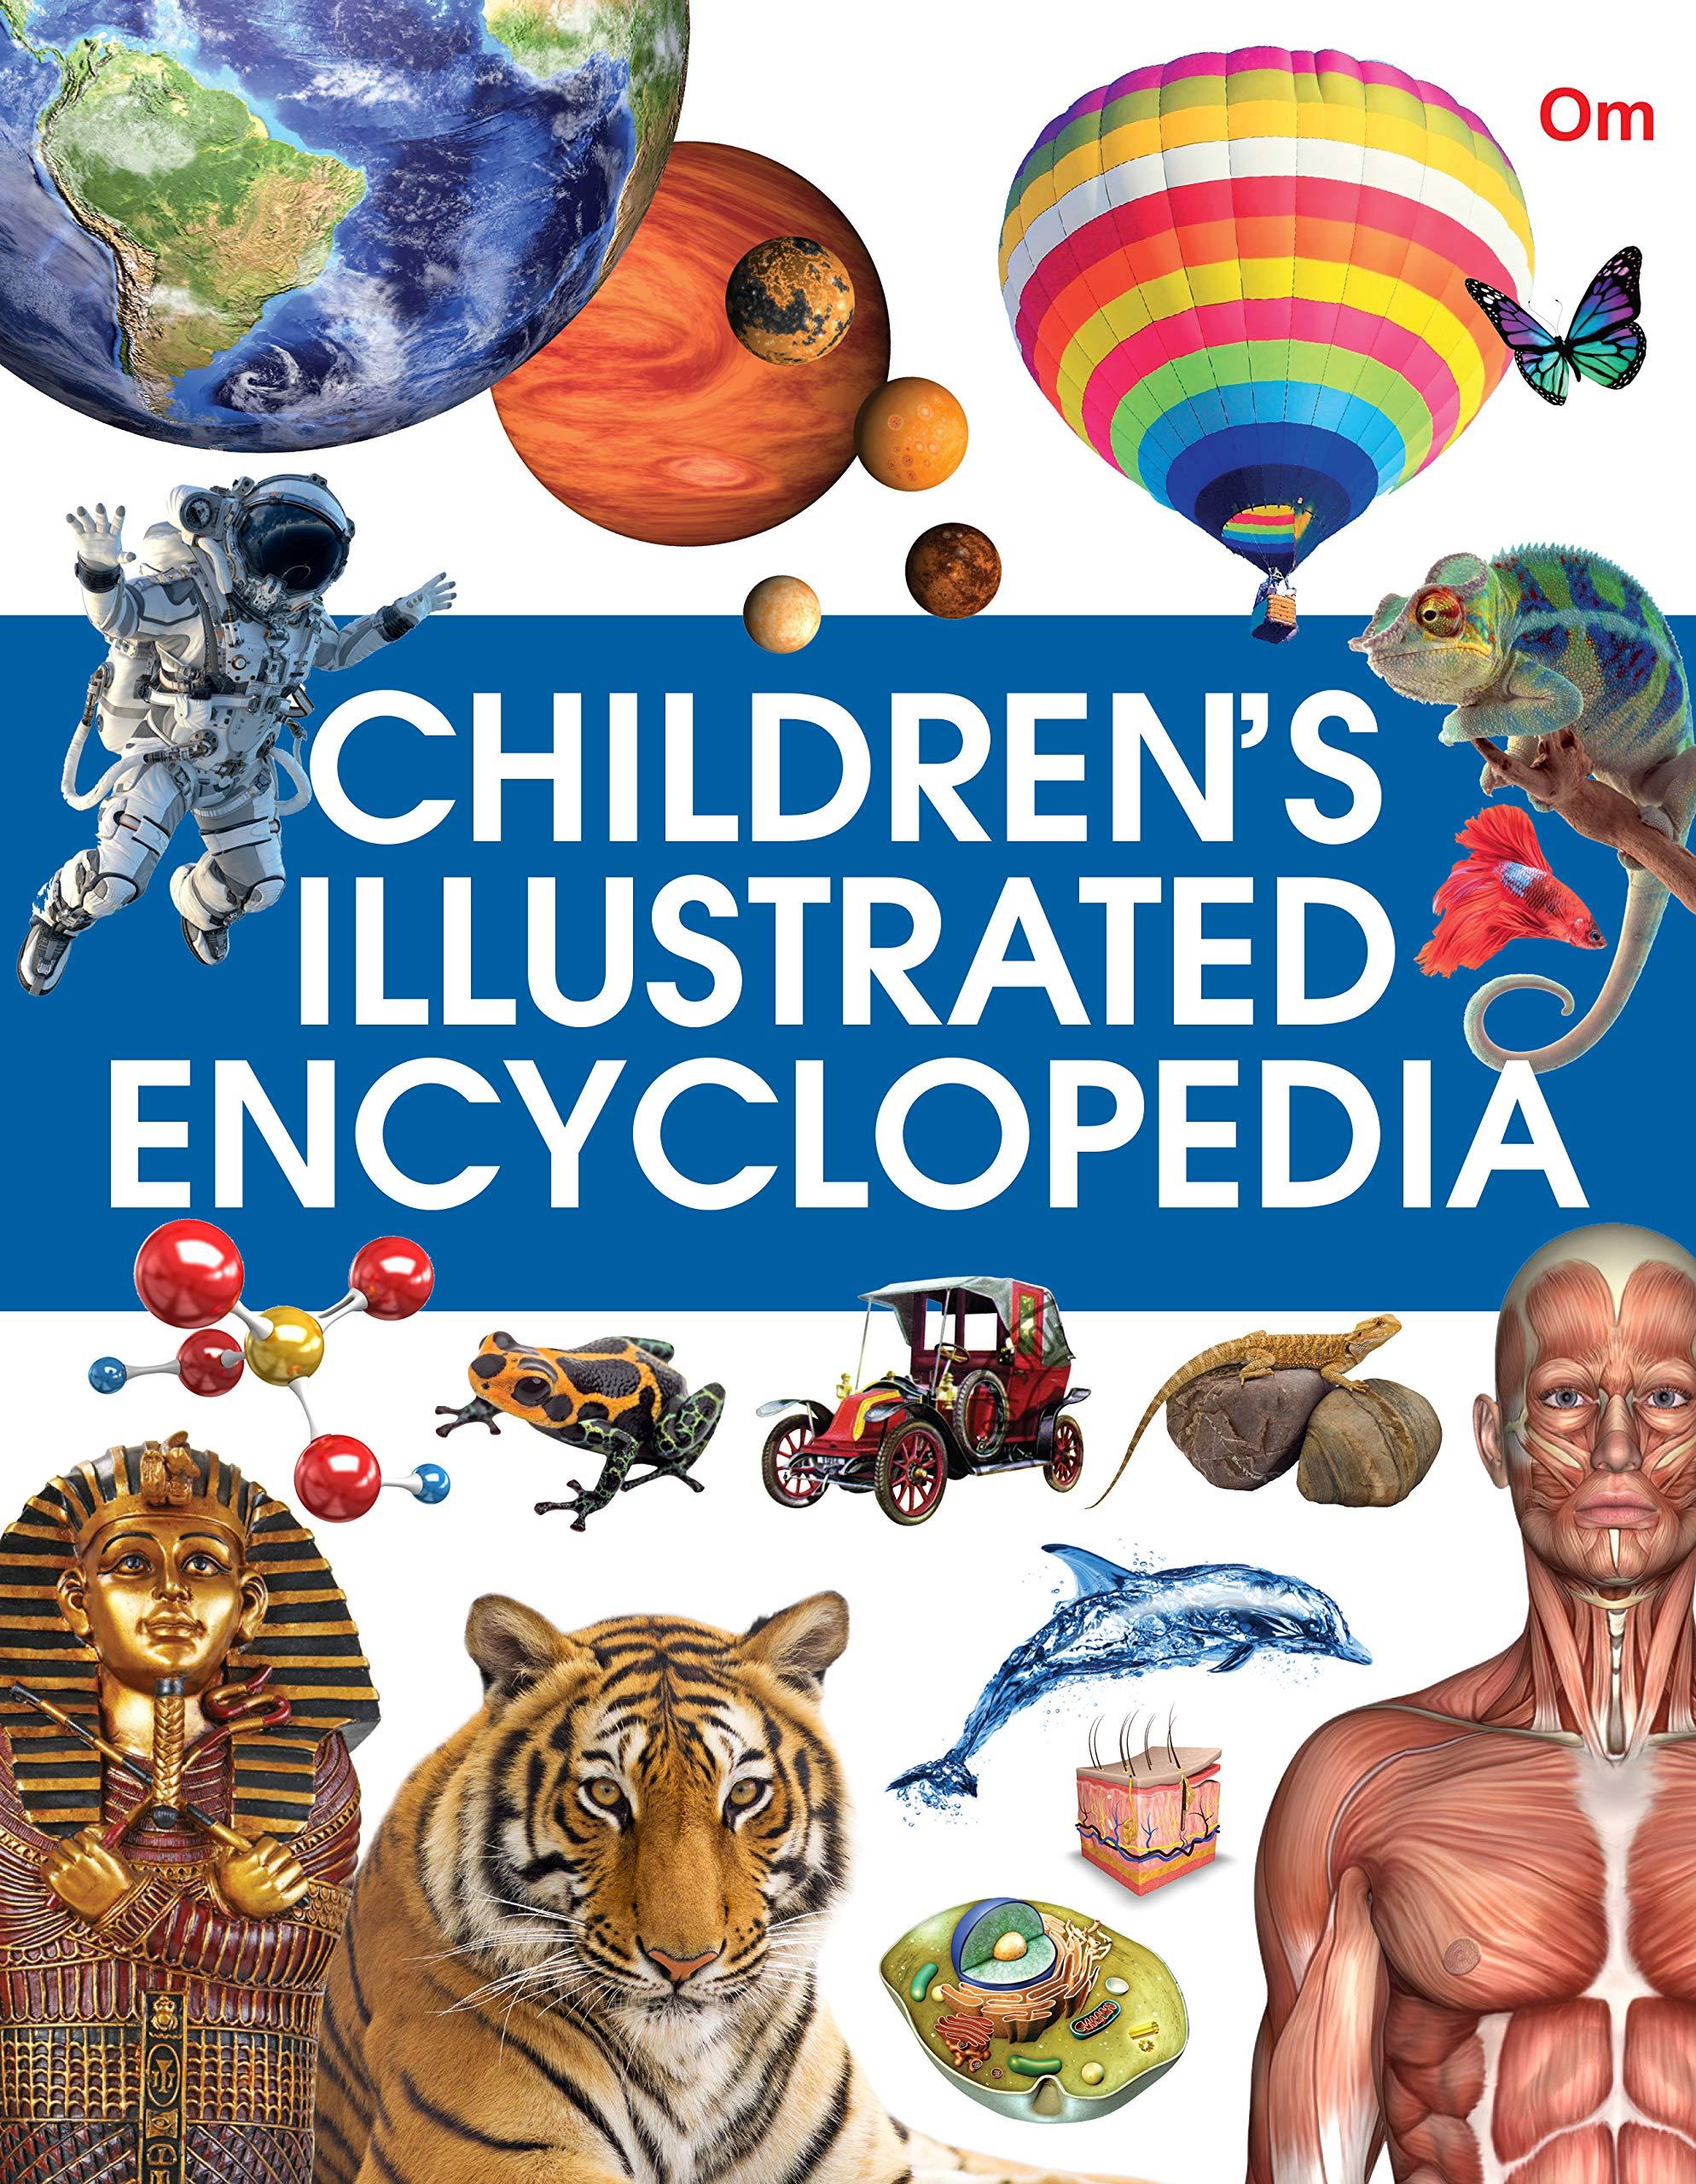 Encyclopedia: Children's Illustrated Encyclopedia